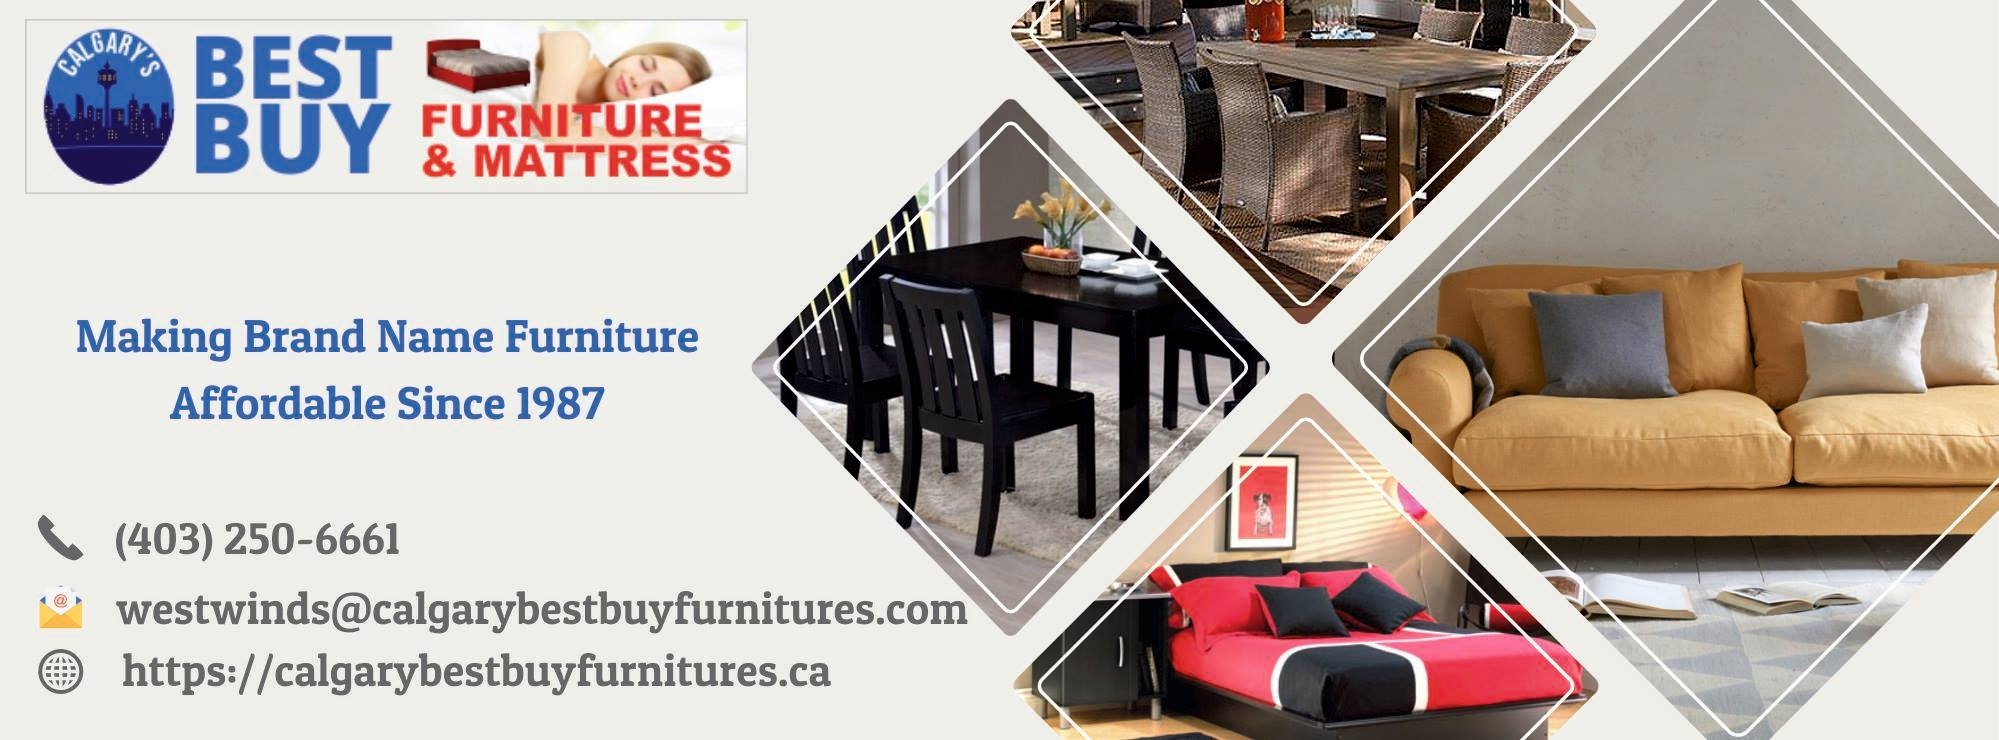 Calgary Best Buy Furniture (@calgarybestbuyfurnitures) Cover Image